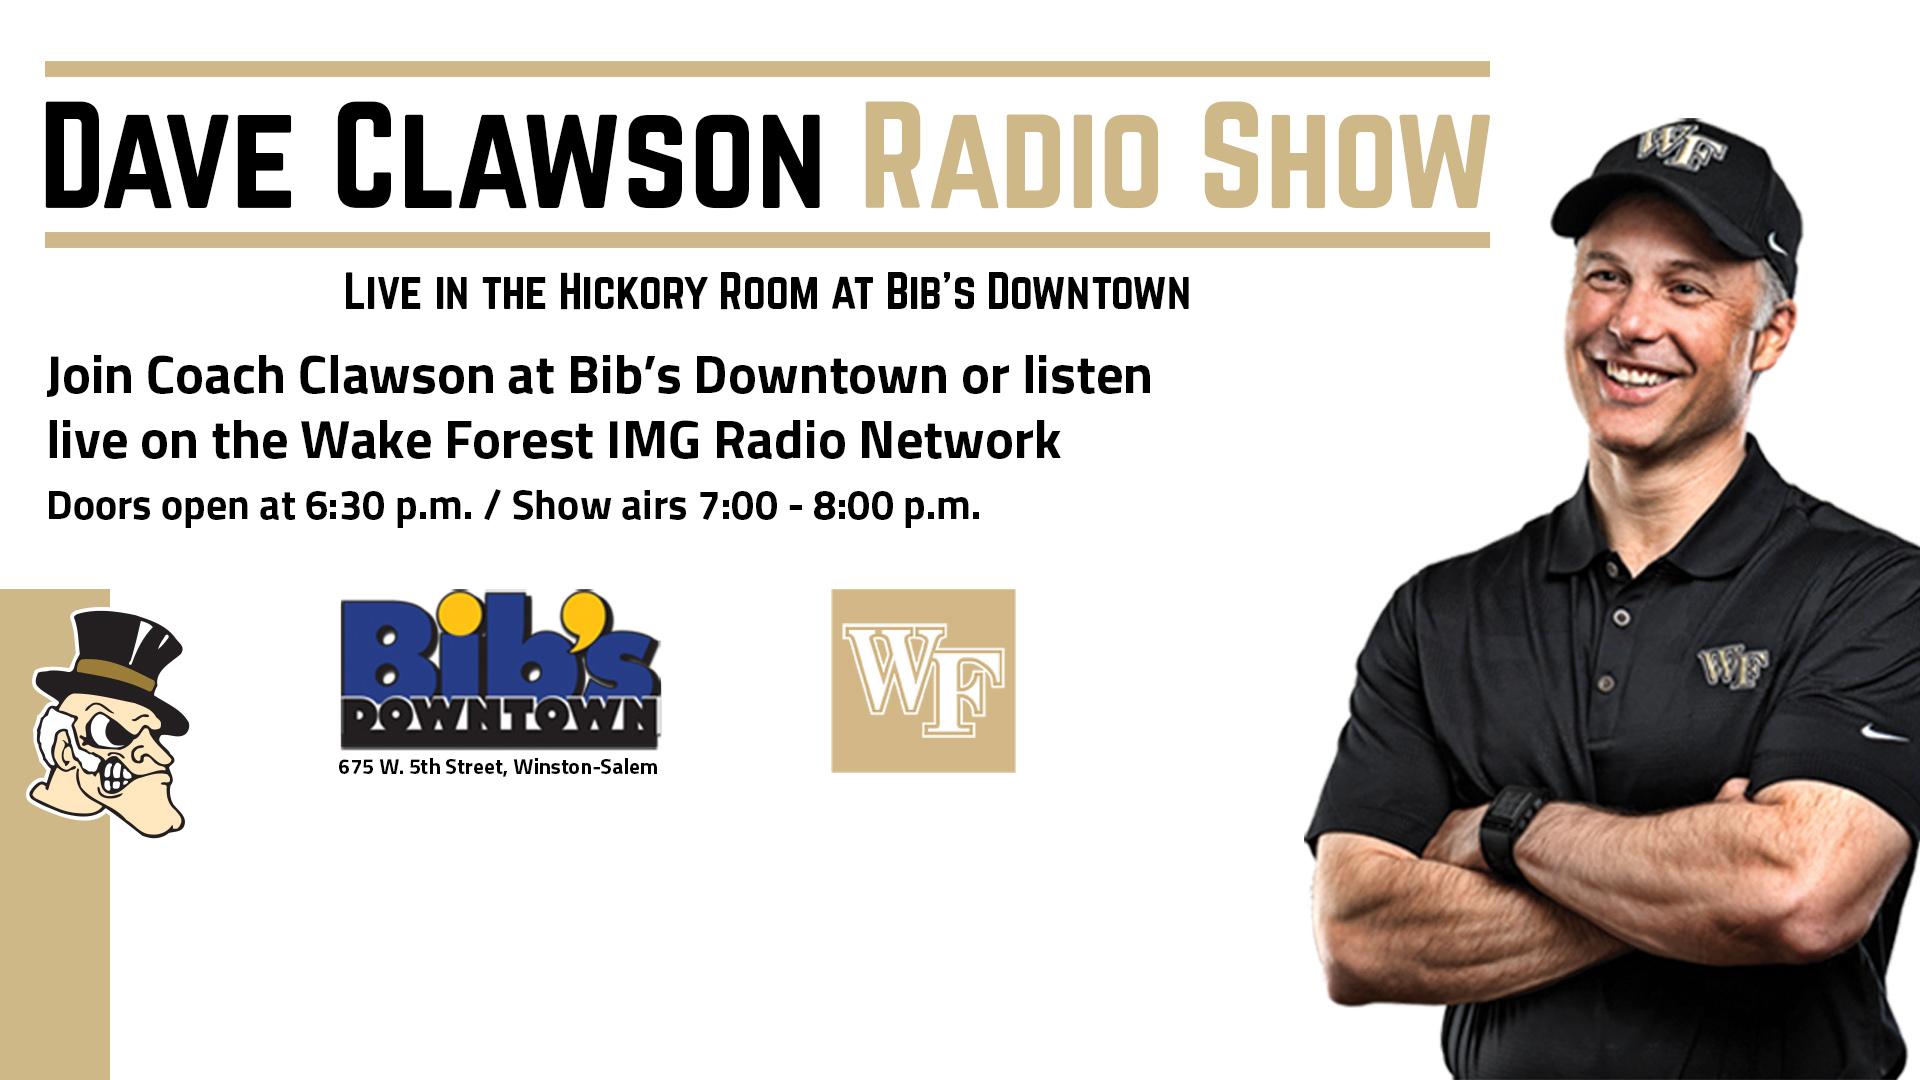 Dave Clawson Radio Show